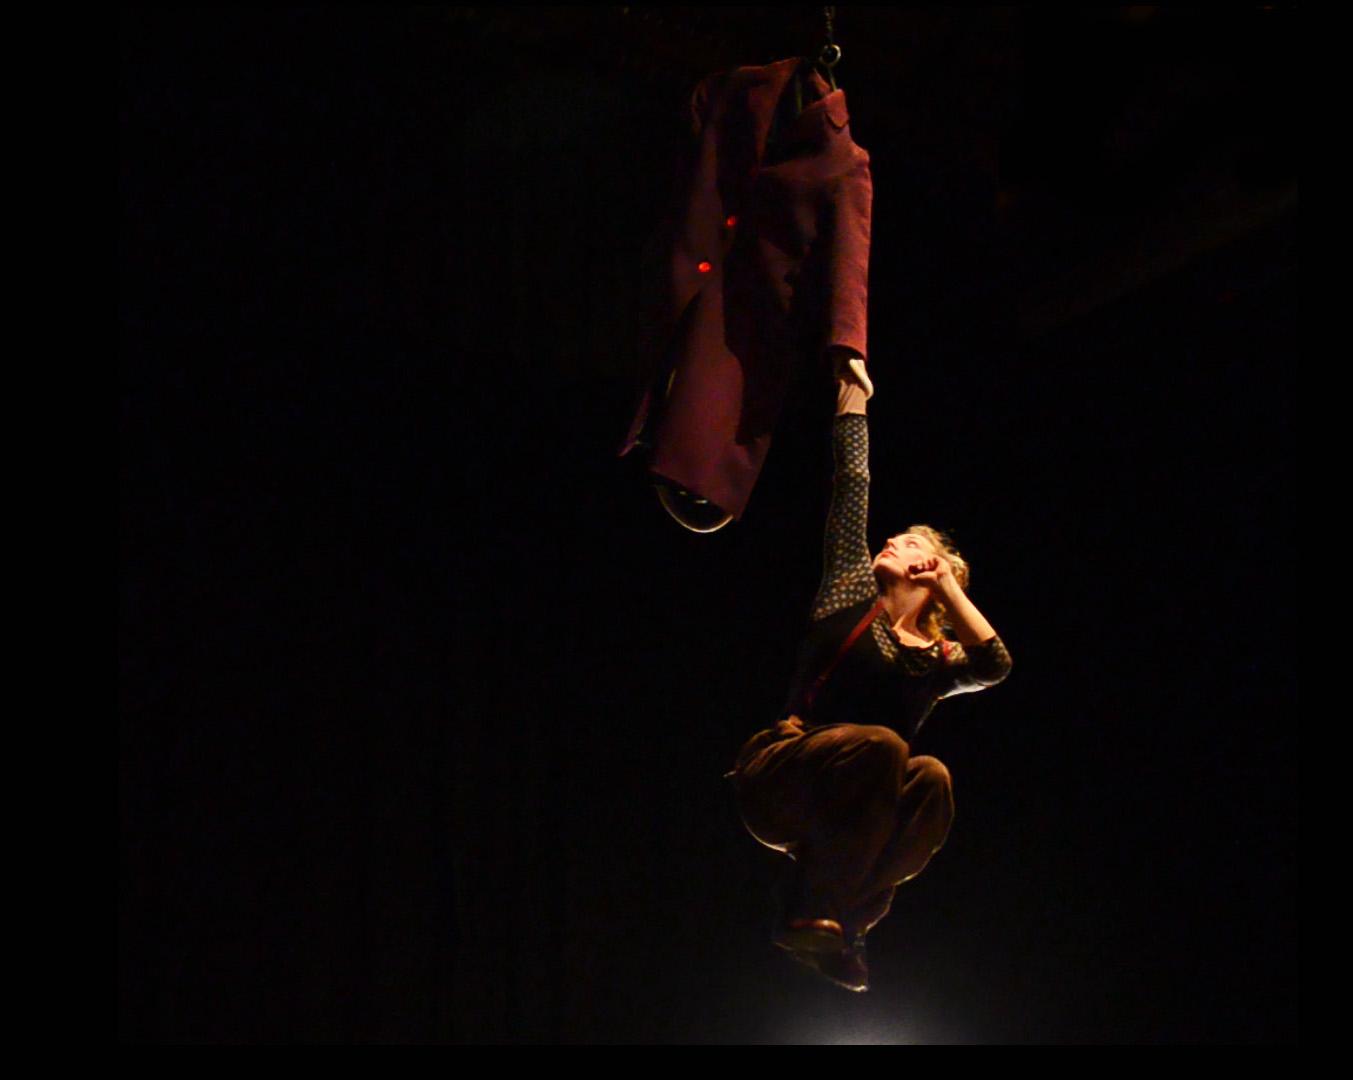 giacca aerea acrobata artista strada